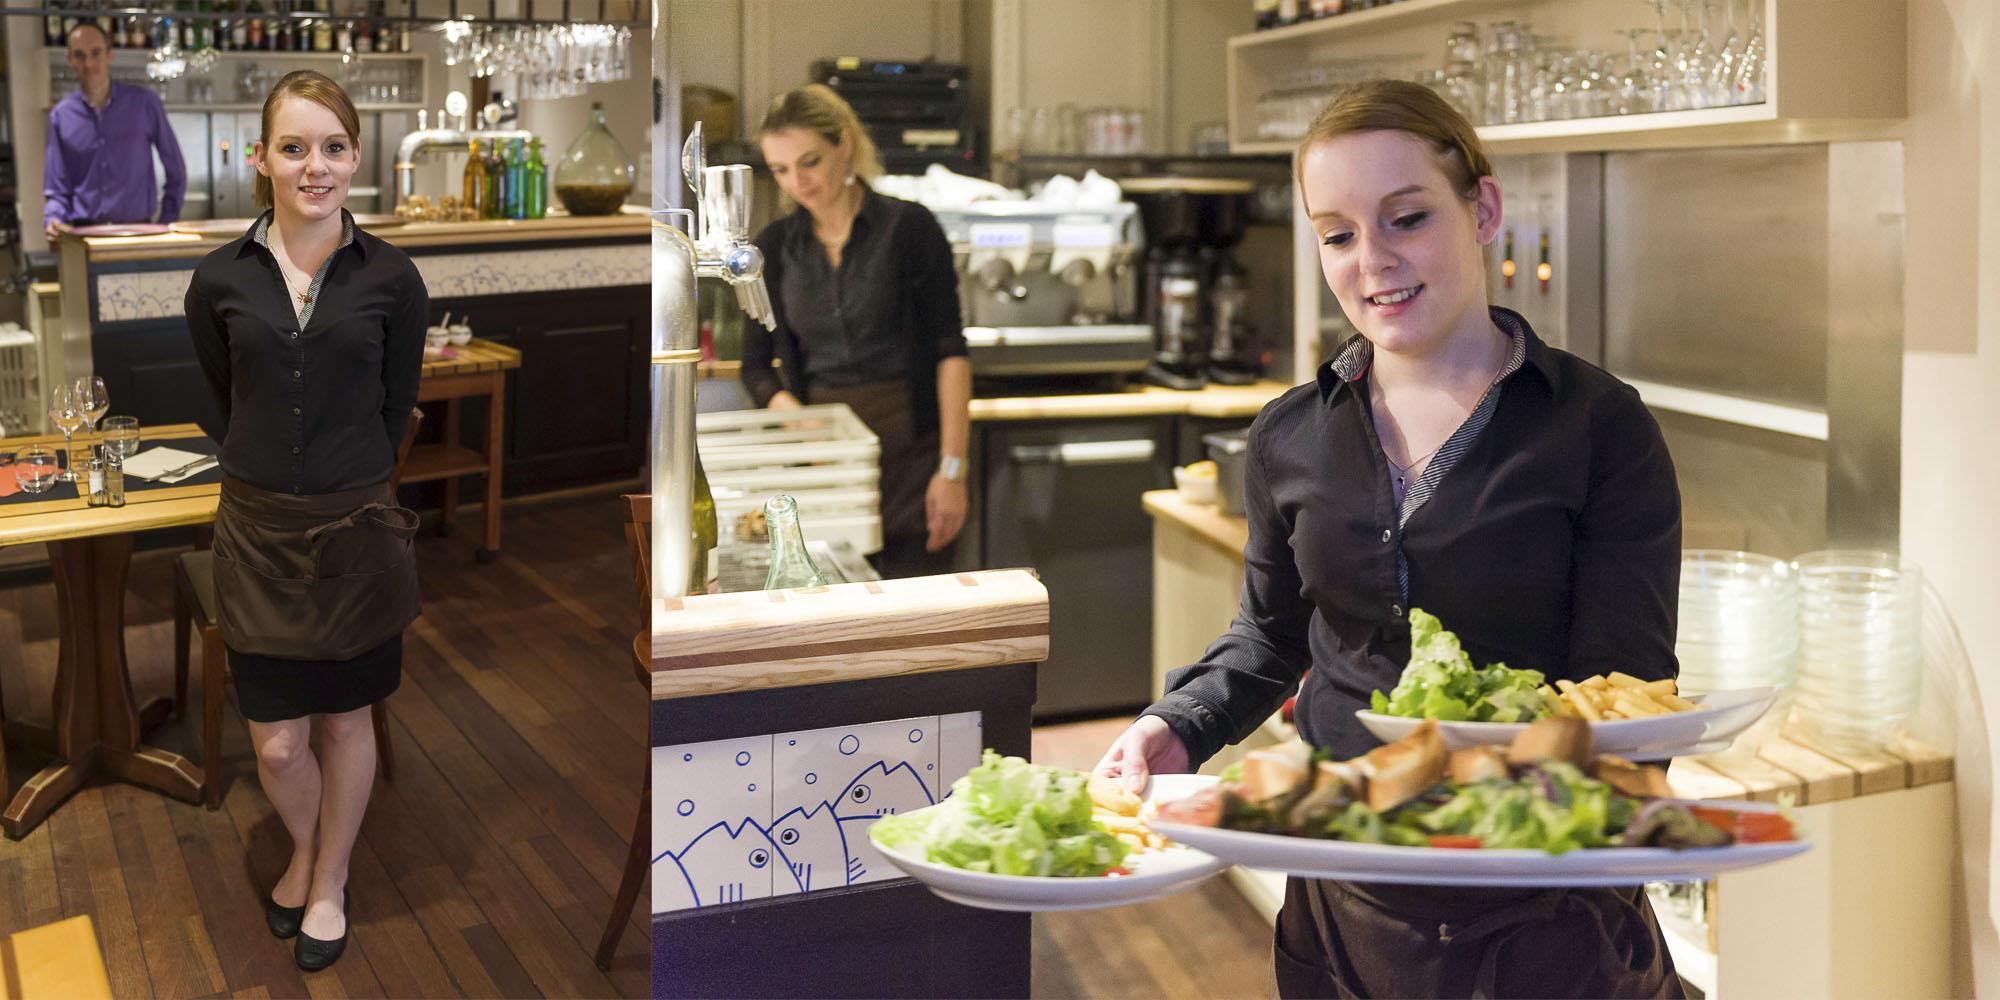 reportage photo, serveuse dans une brasserie vannetaise.